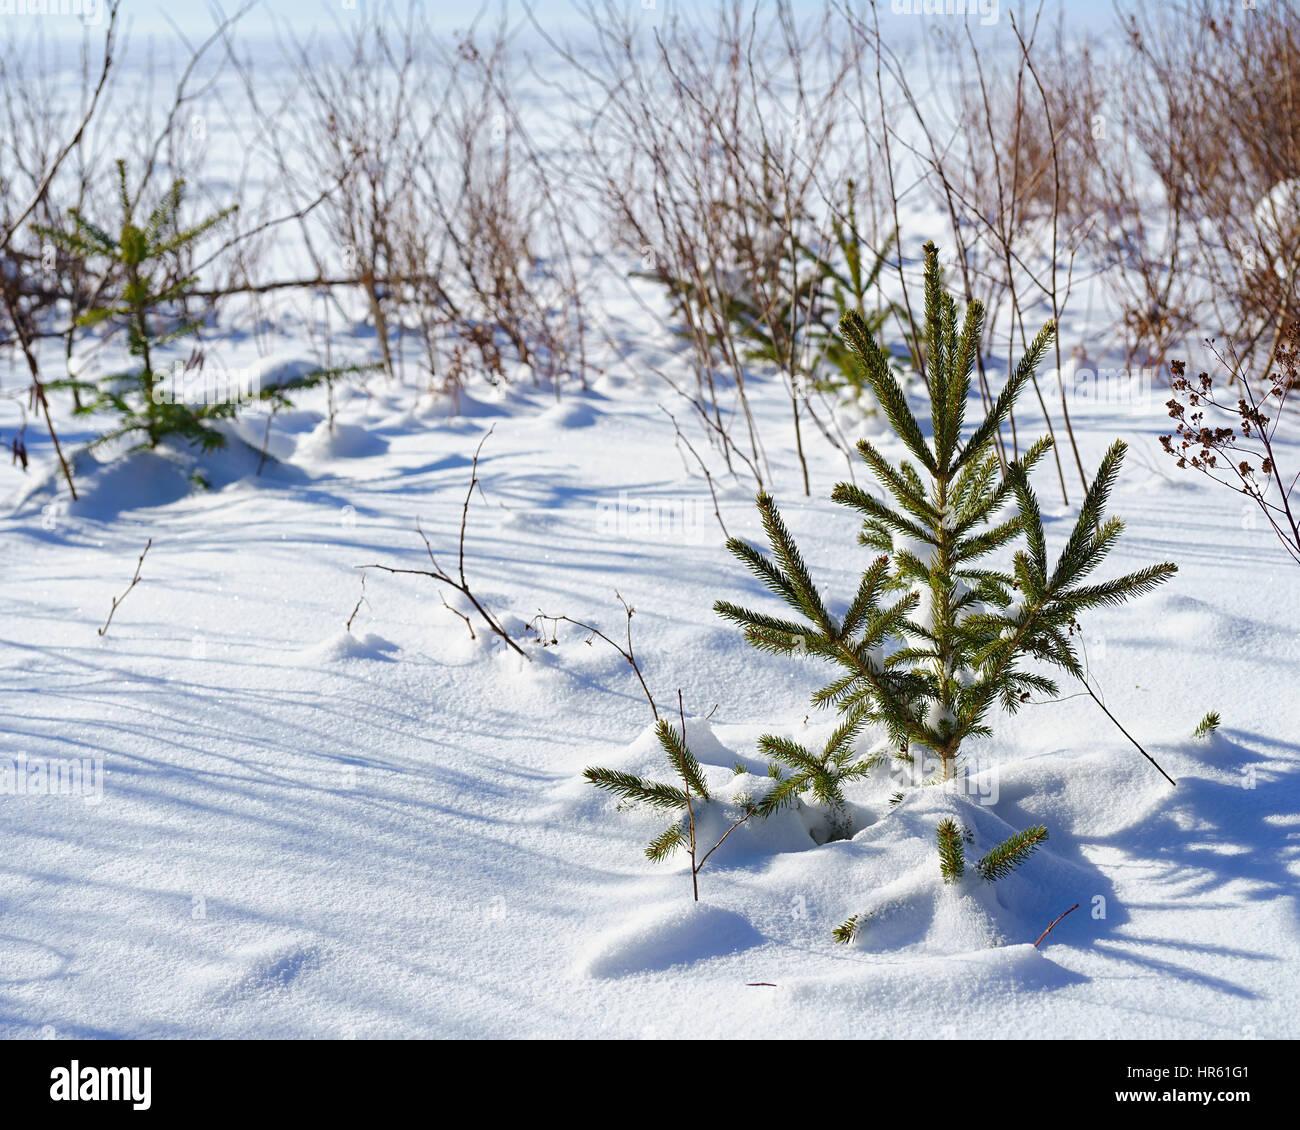 Little spruce tree in the winter landscape. - Stock Image